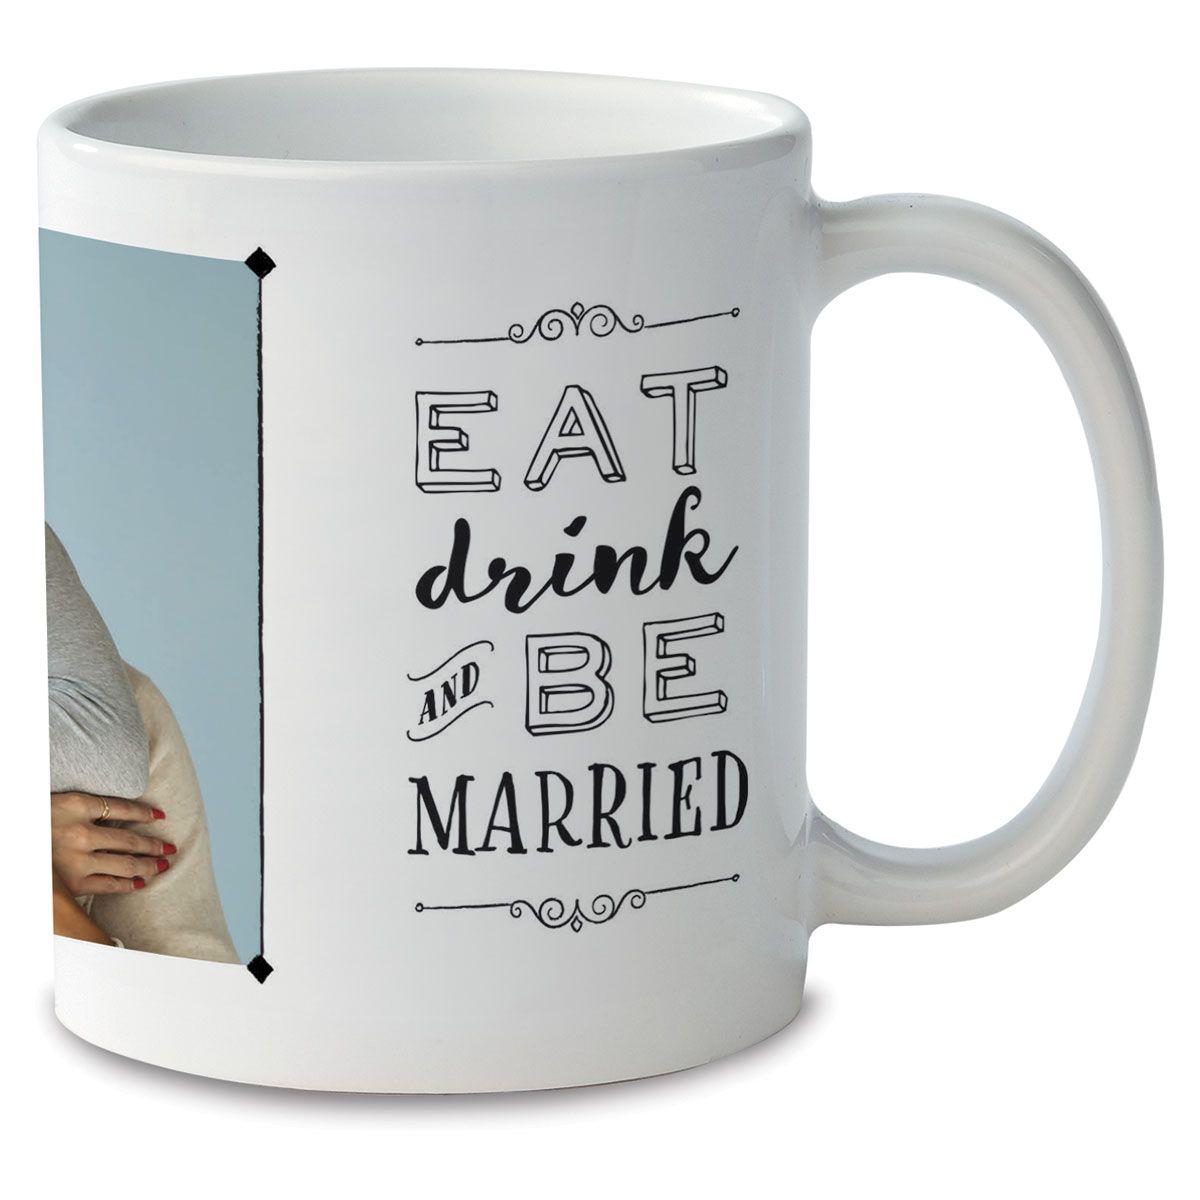 Be Married Personalized Photo Mug